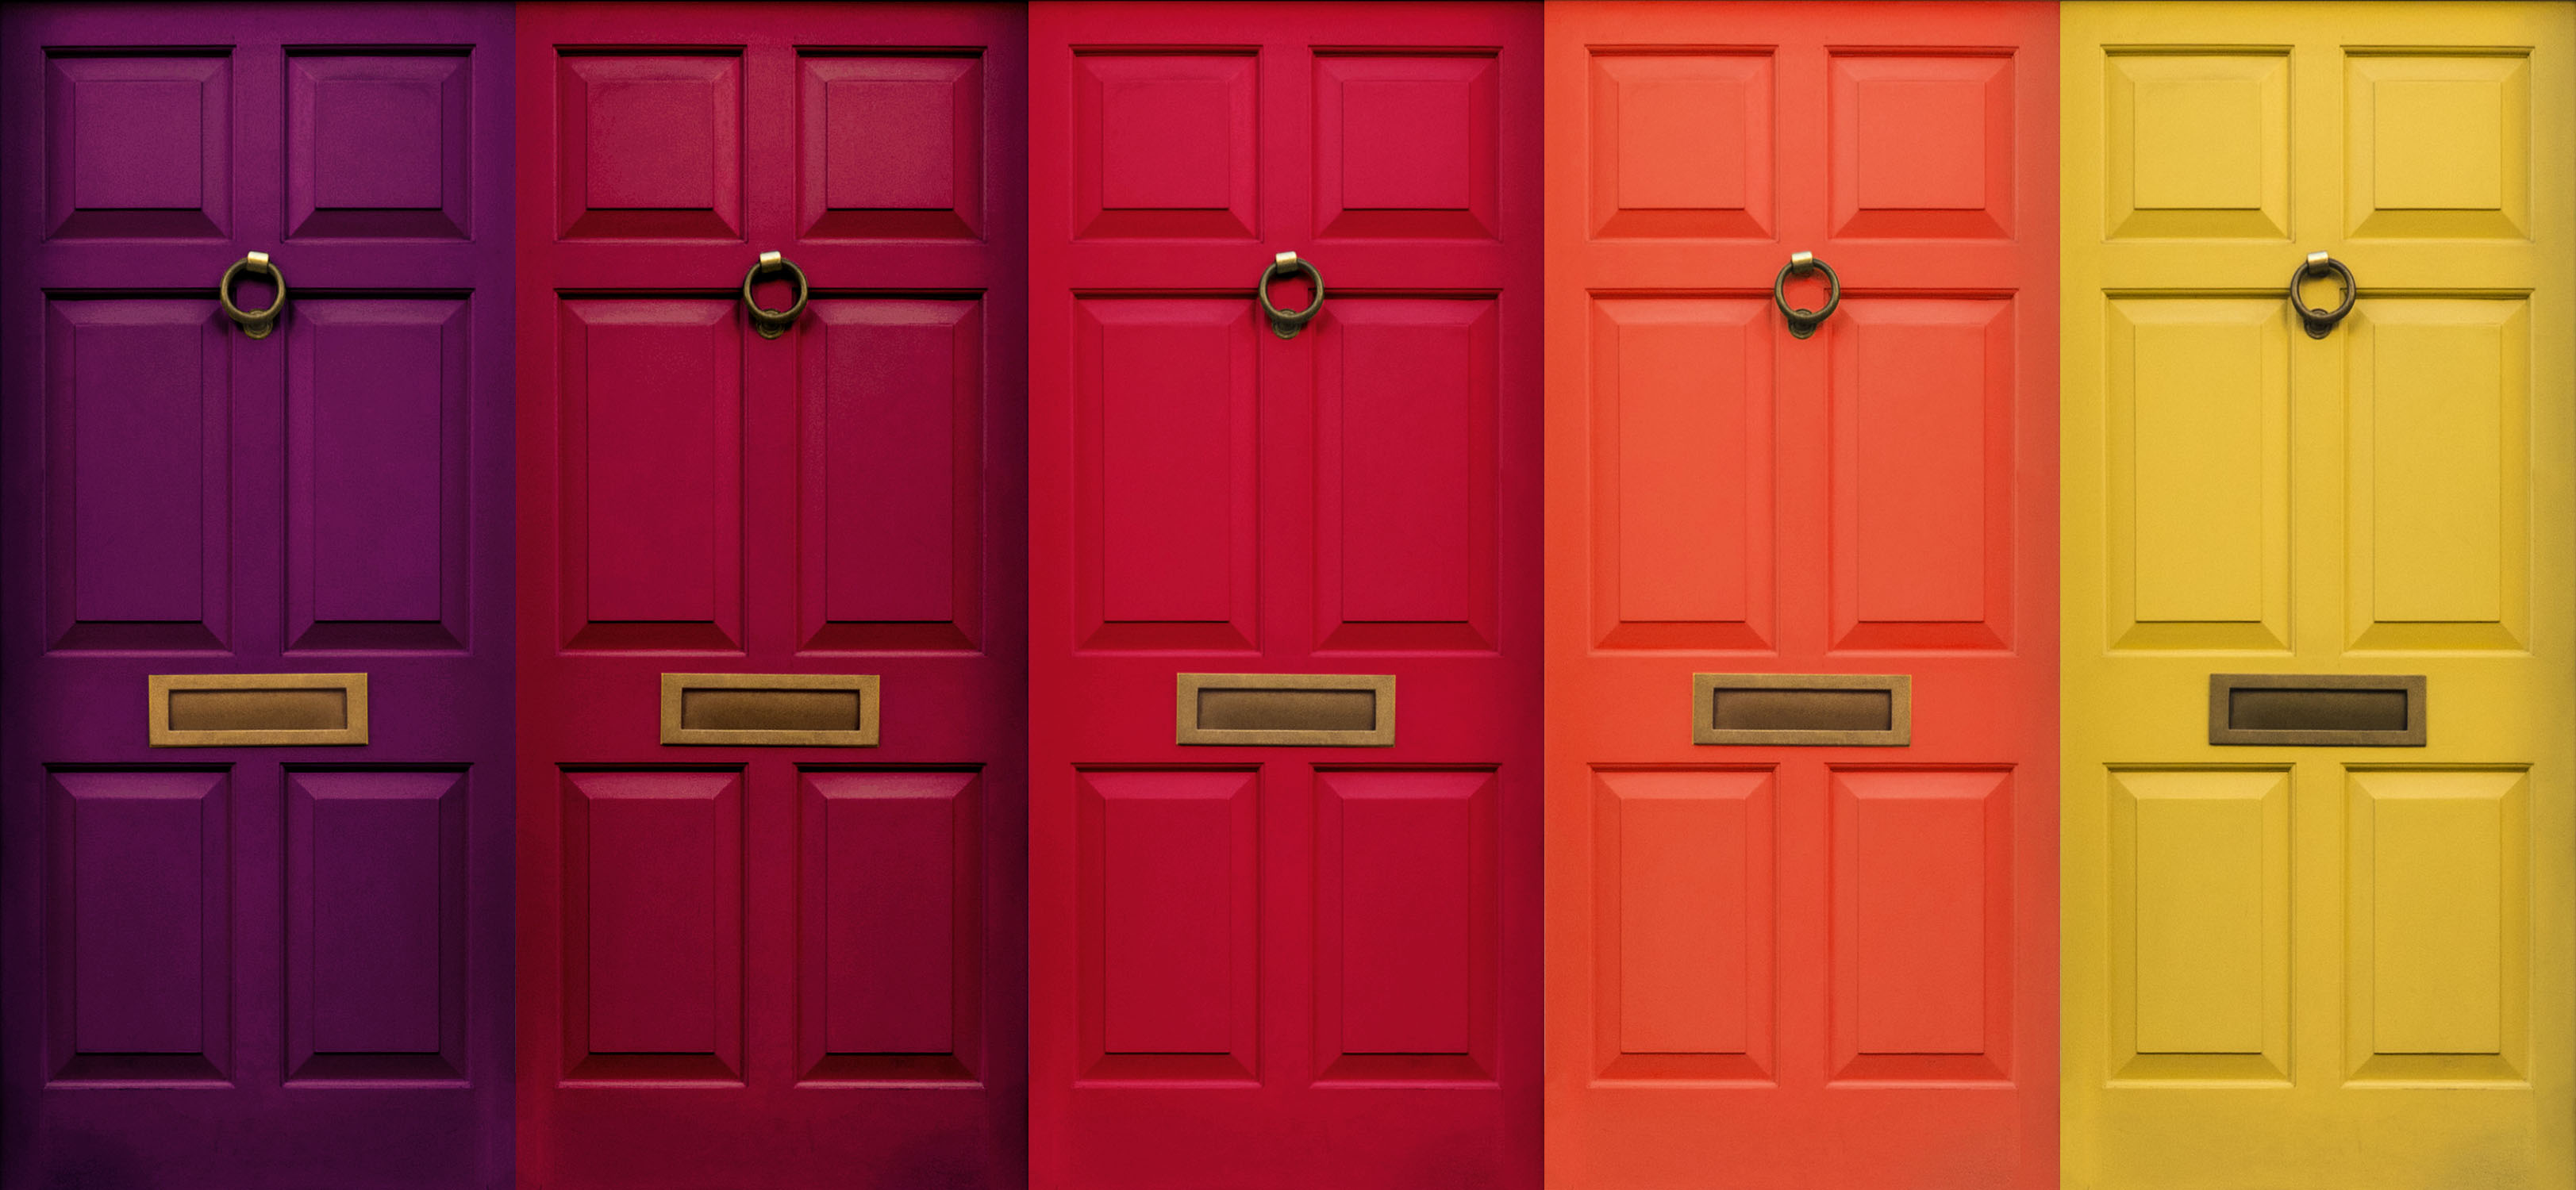 Bring more Business to your Door...